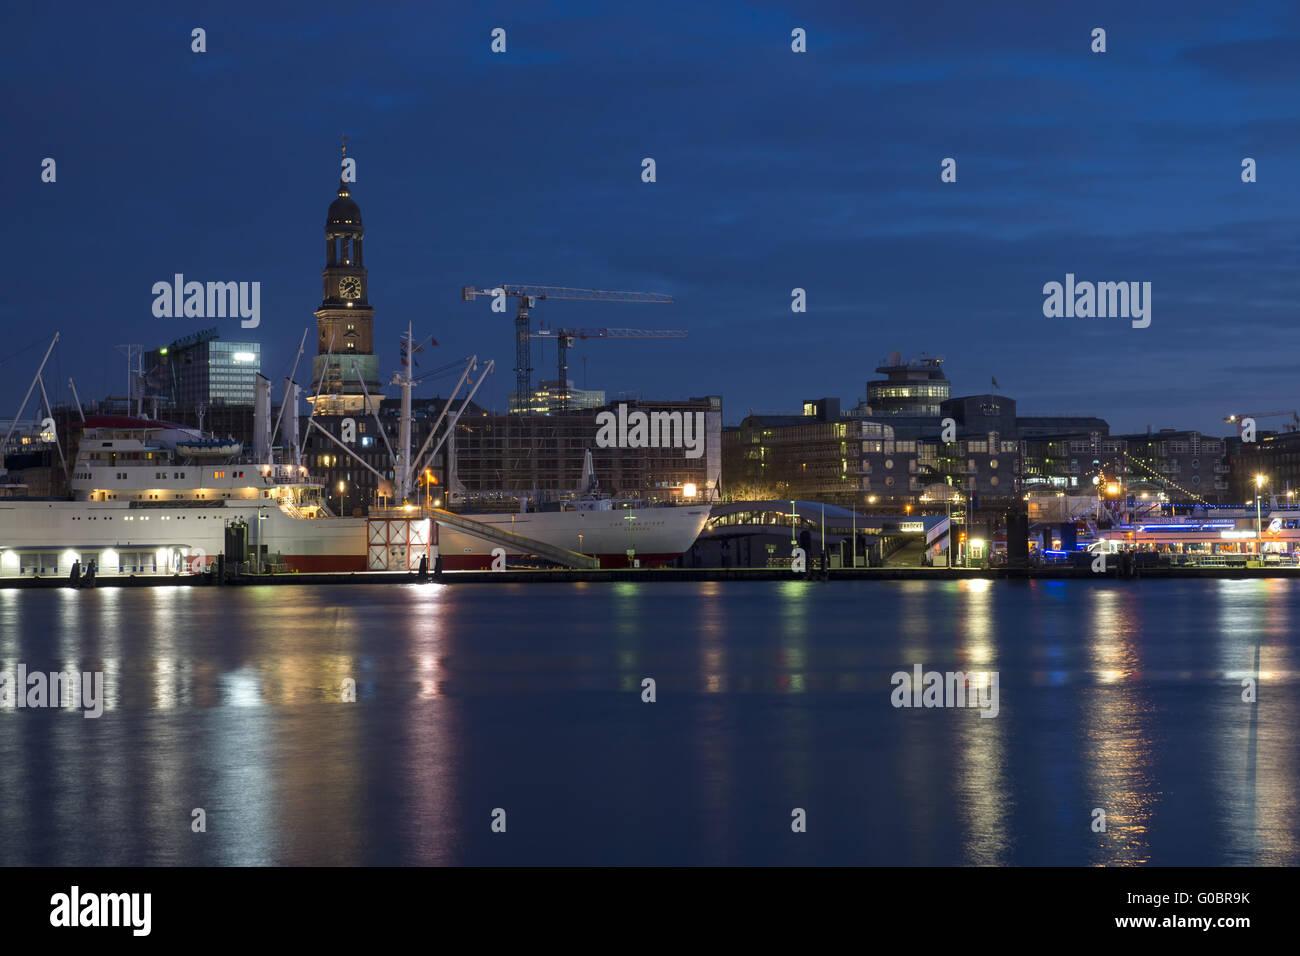 The harbor of Hamburg with St. Michaelis, Germany - Stock Image